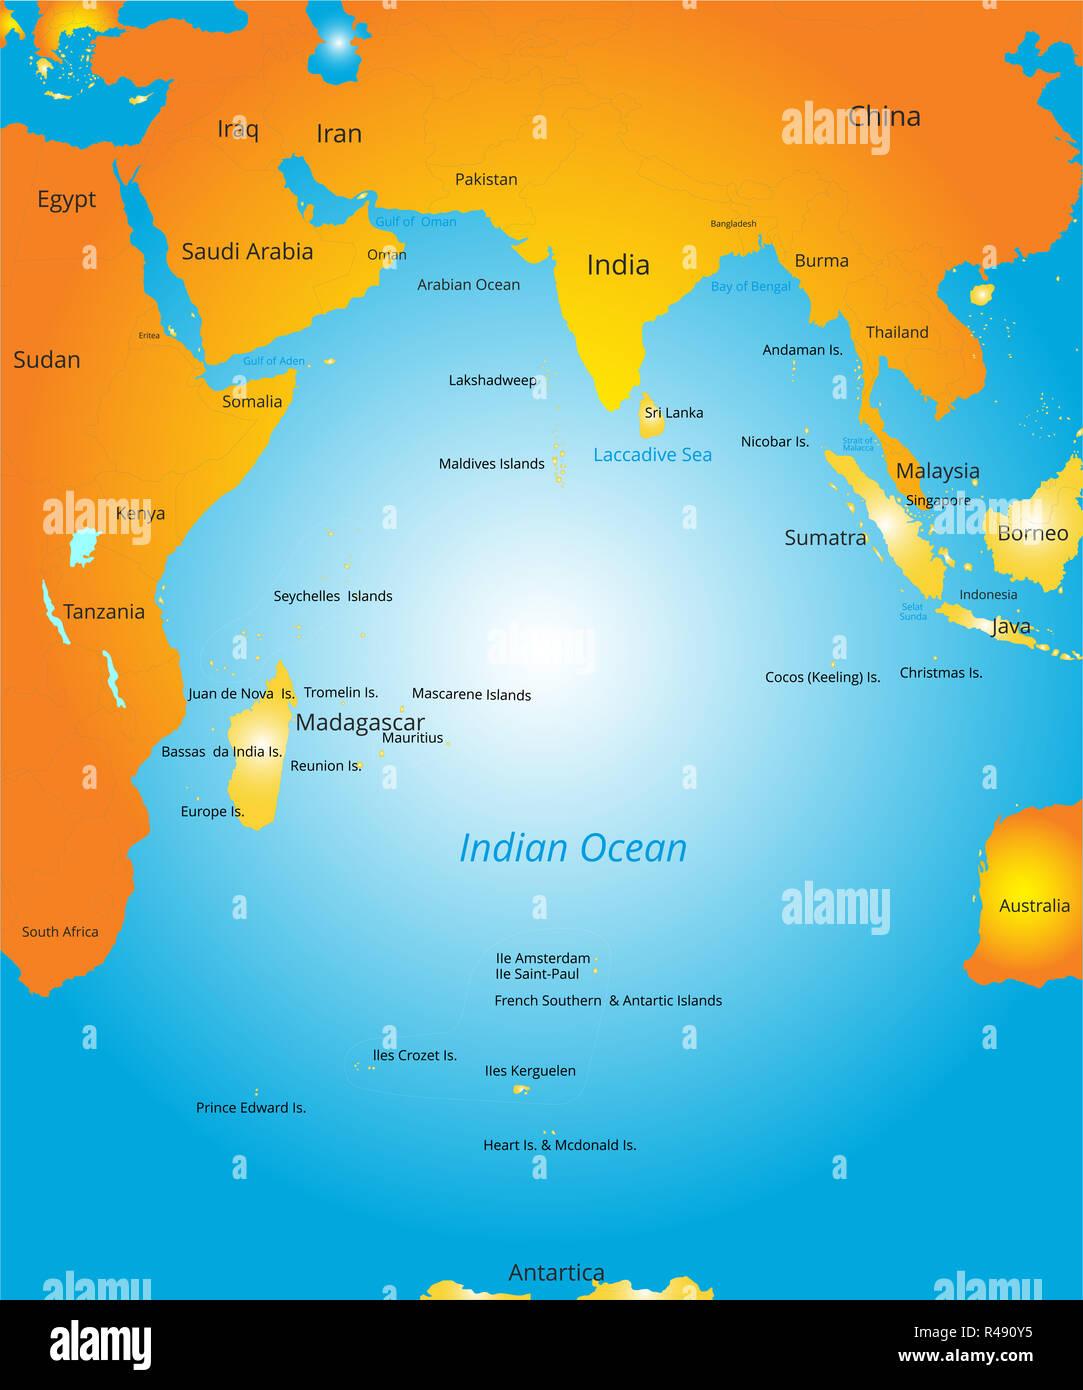 Ios Cartina Geografica.Oceano Indiano Cartina Geografica